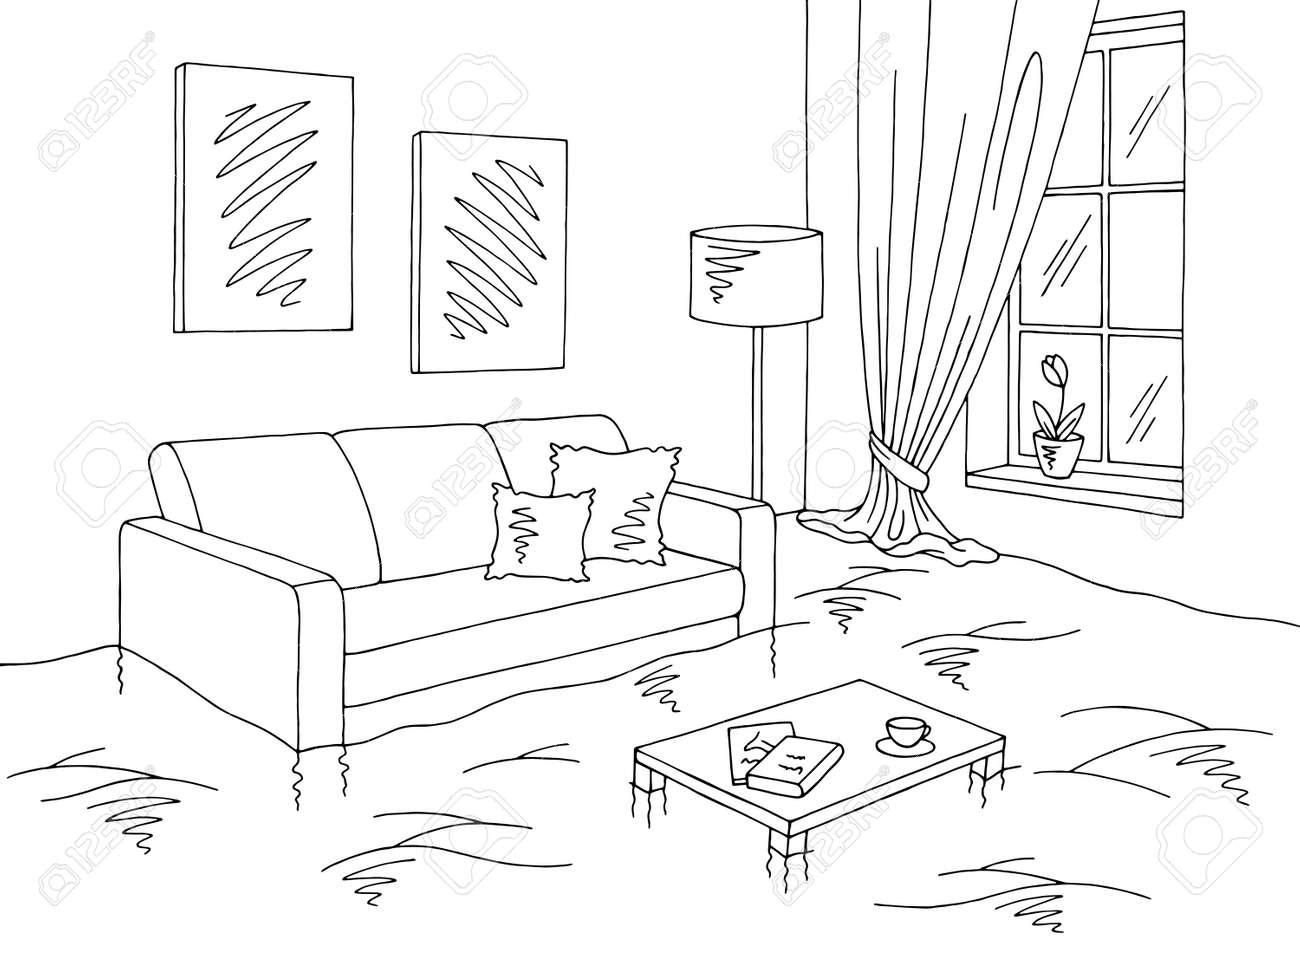 Flood Living Room Graphic Black White Home Interior Sketch